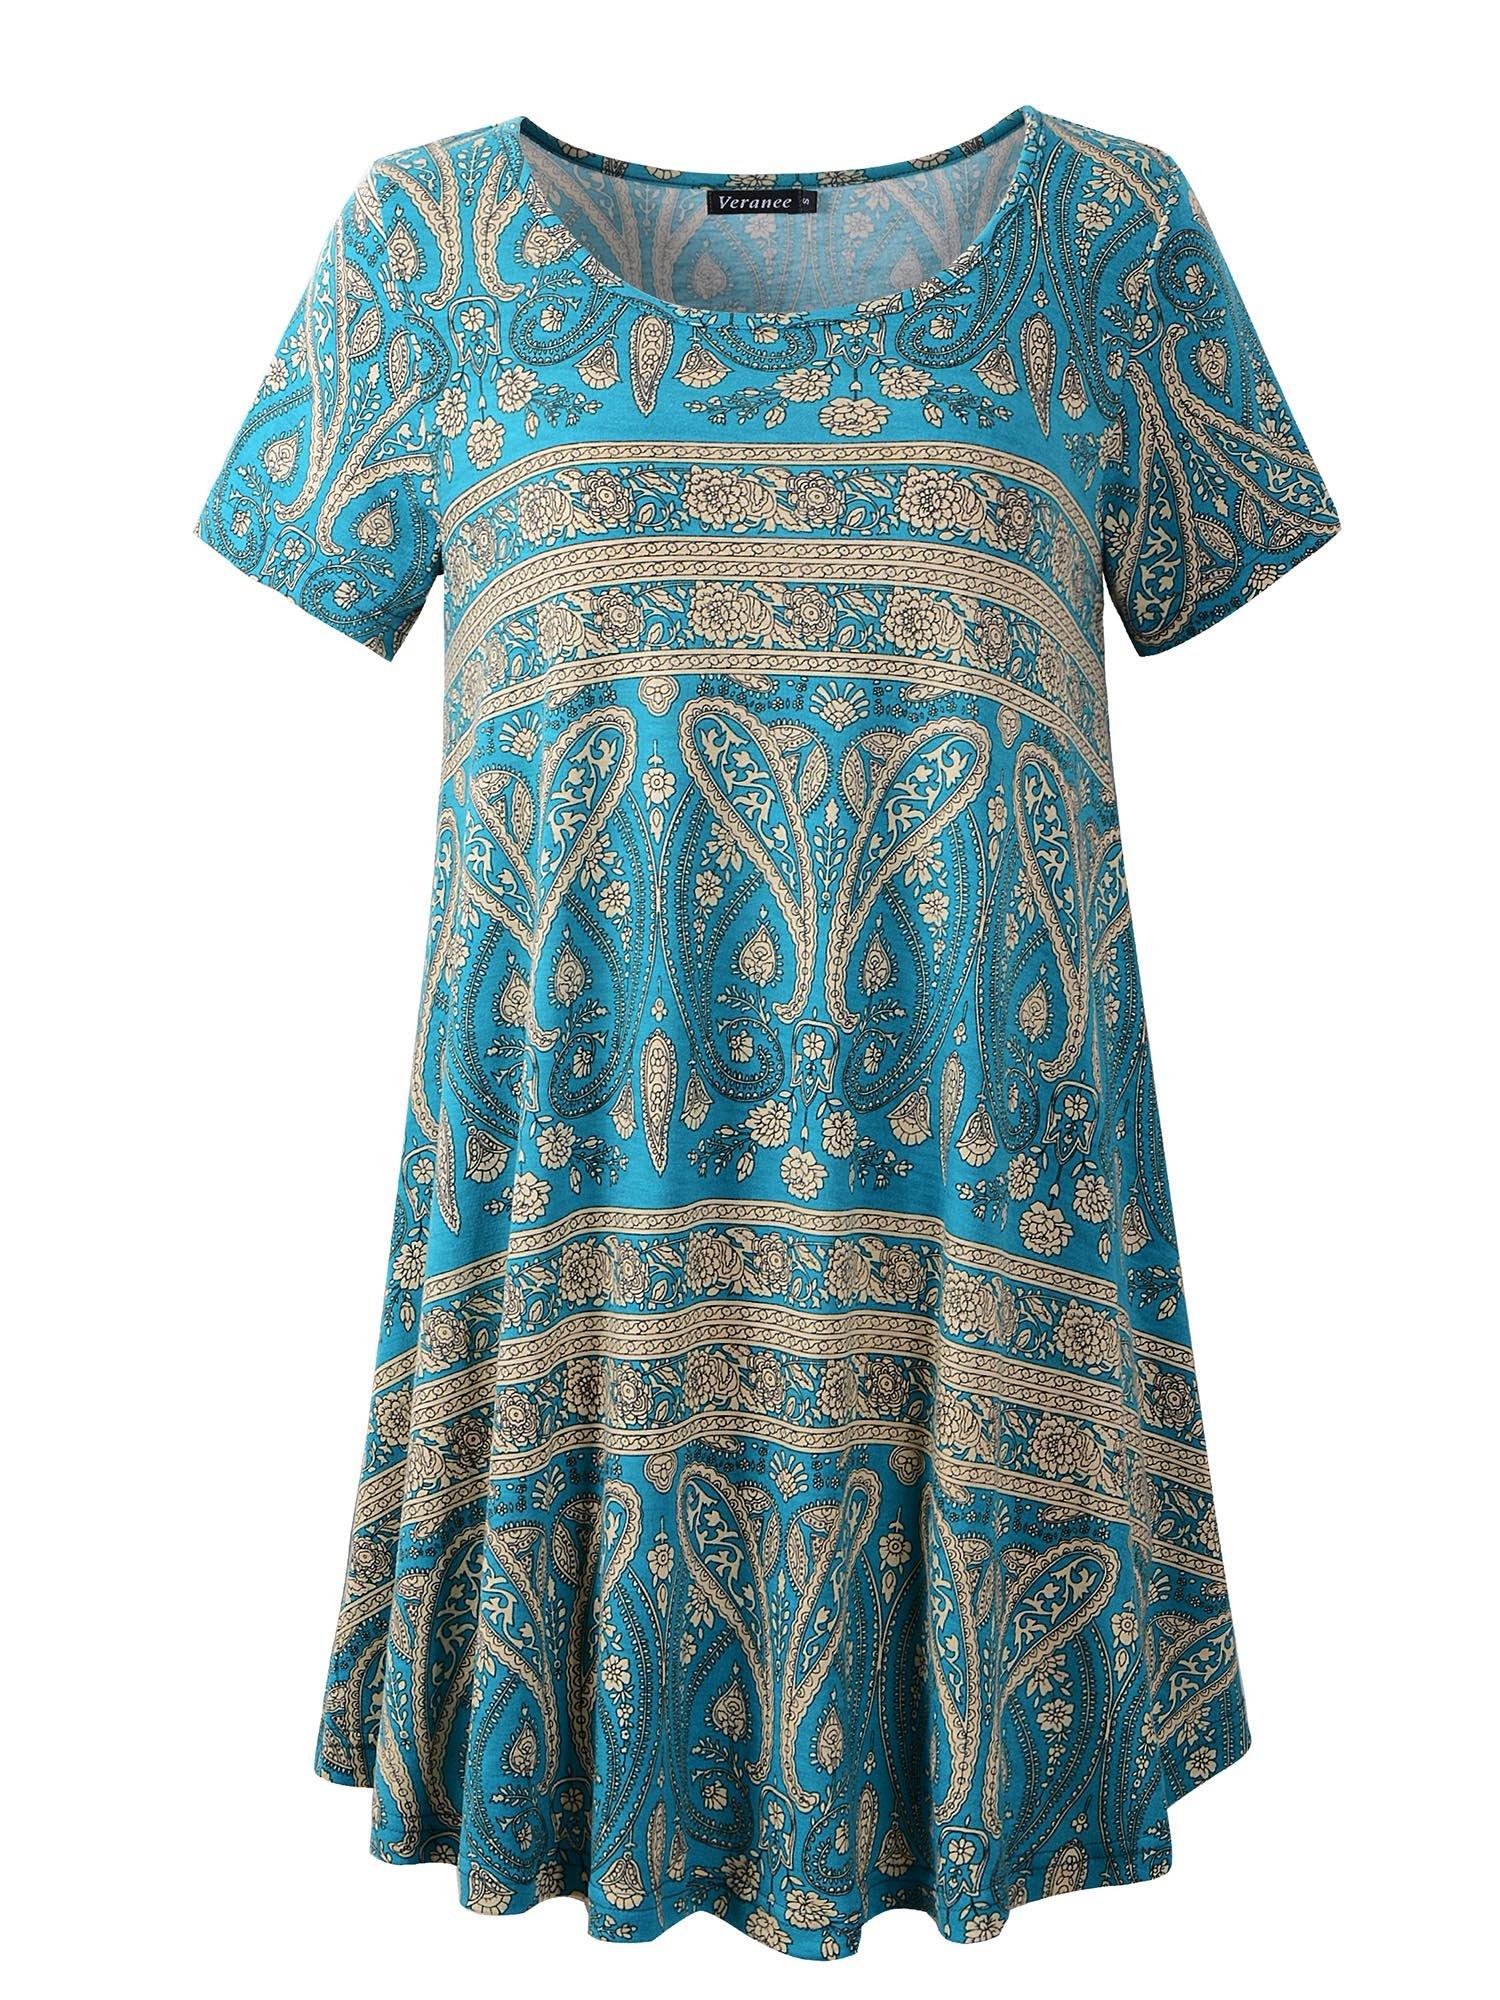 Veranee Women's Plus Size Swing Tunic Top Short Sleeve Floral Flare T-Shirt (XXX-Large, 56-4)